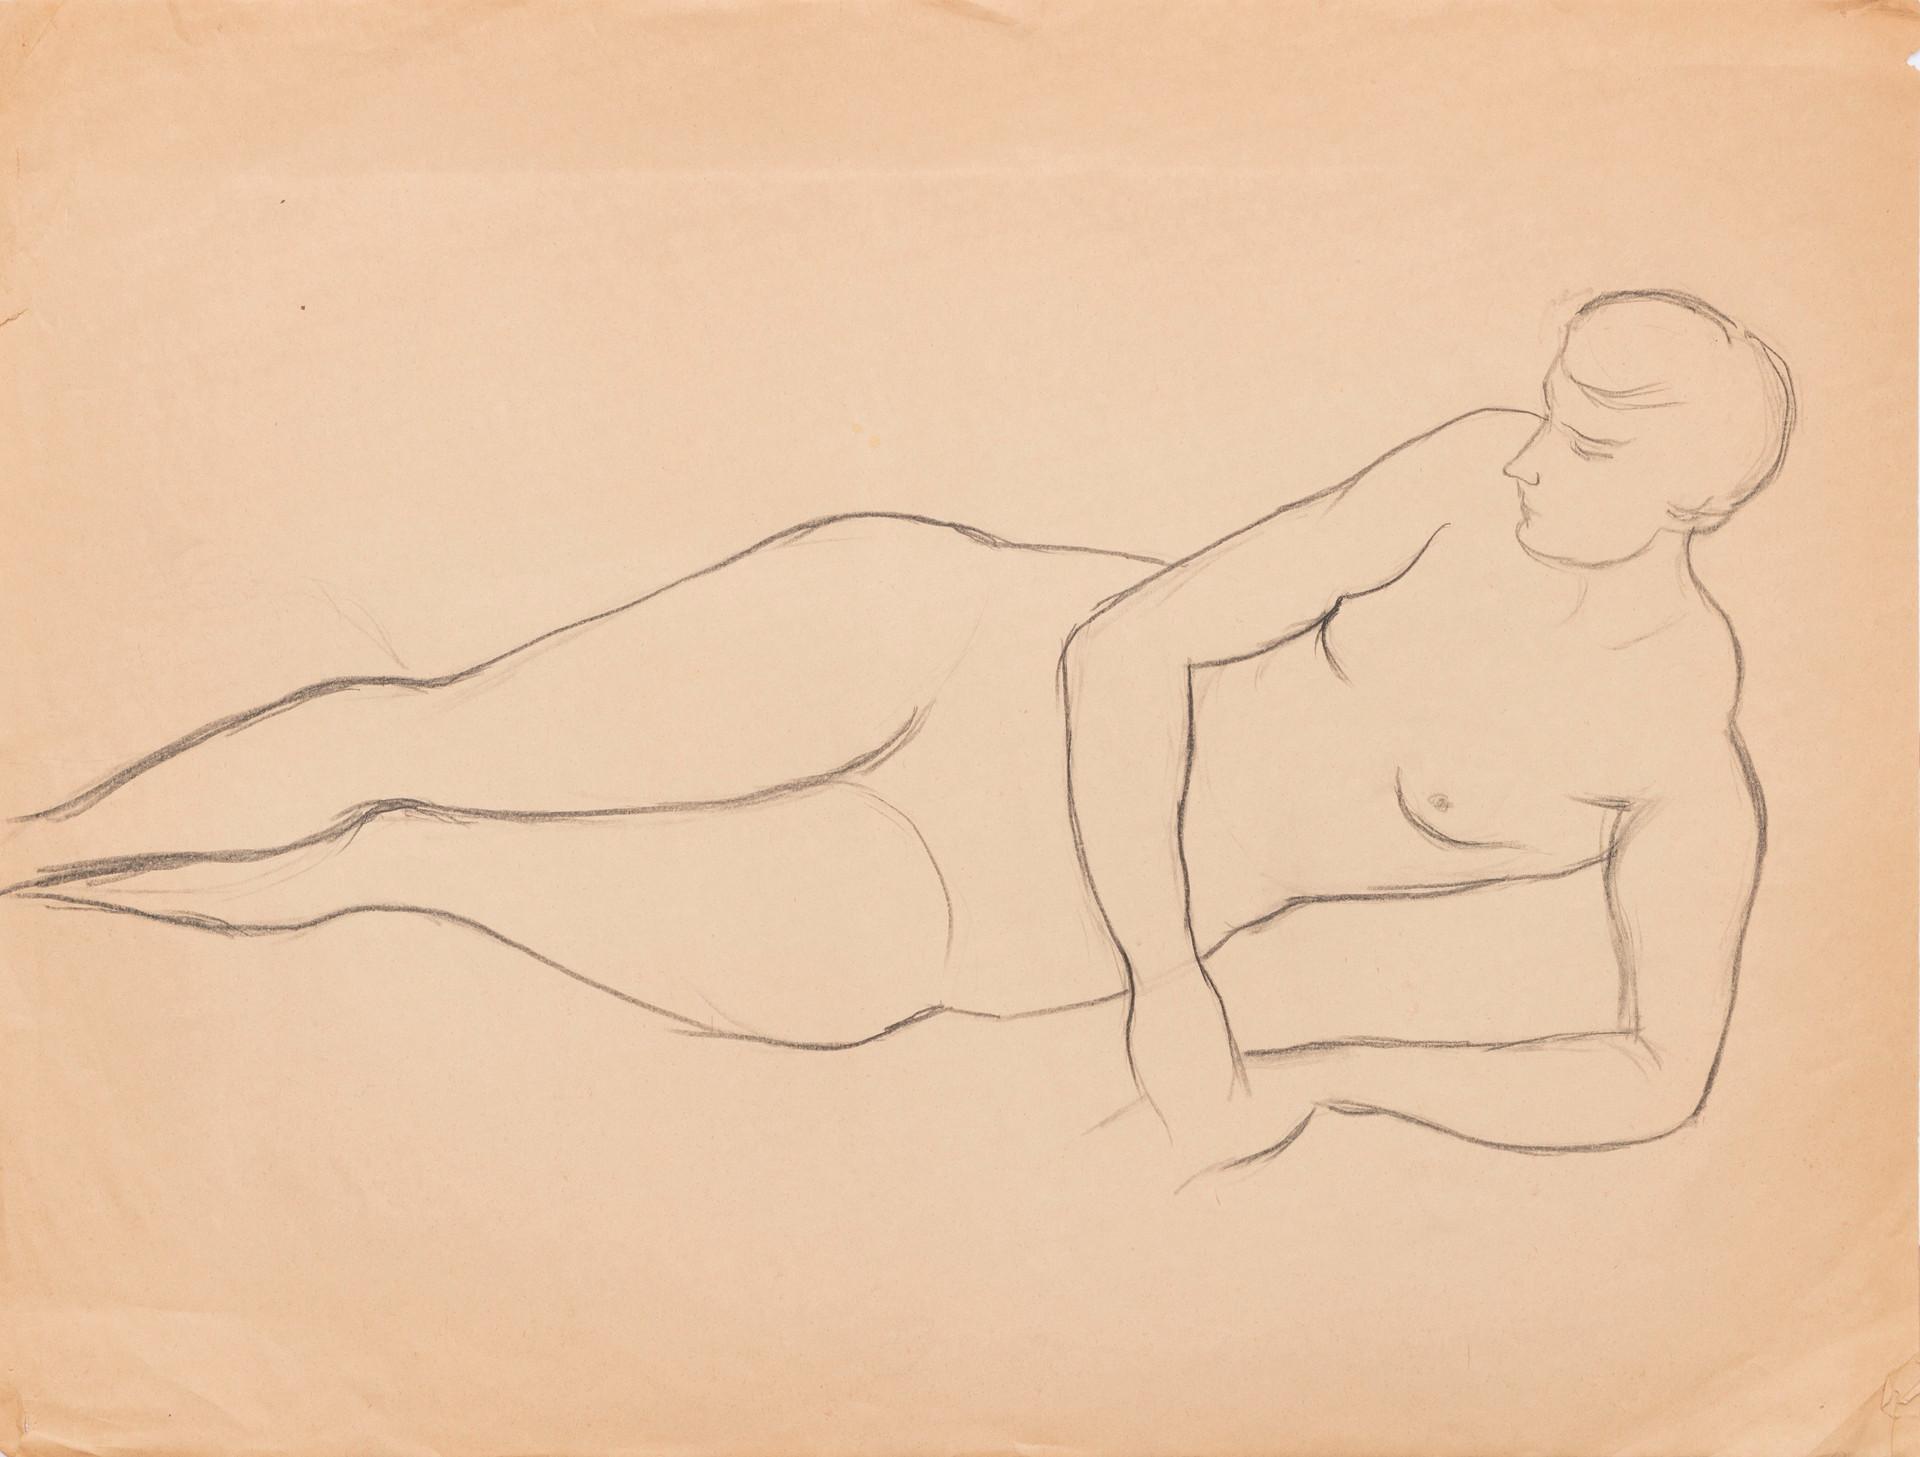 Untitled sketch - nude female lying